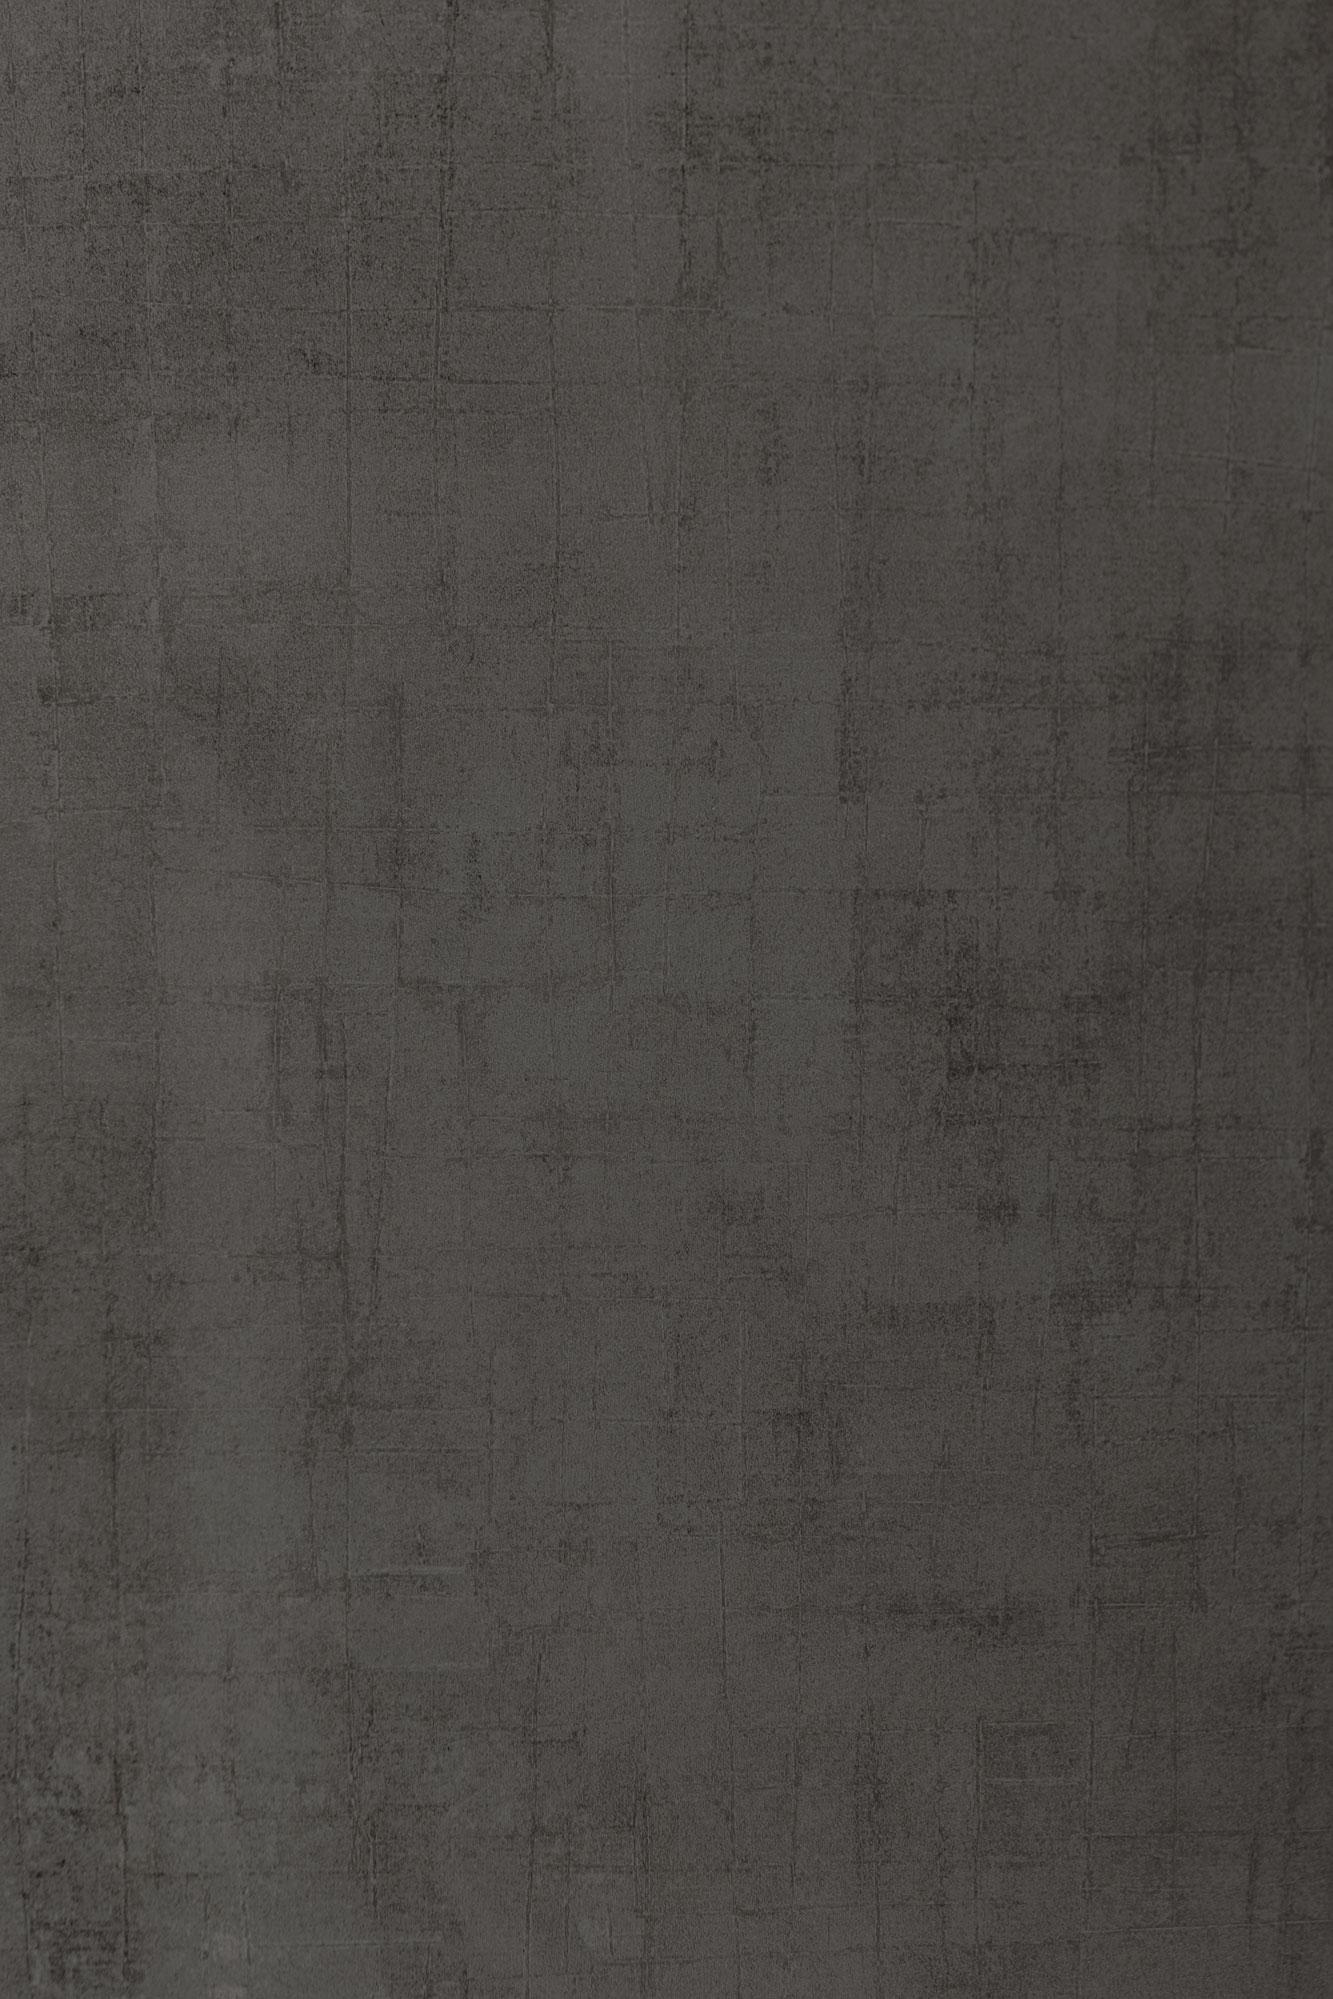 DT0033 HG Серебристо-серая геометрия